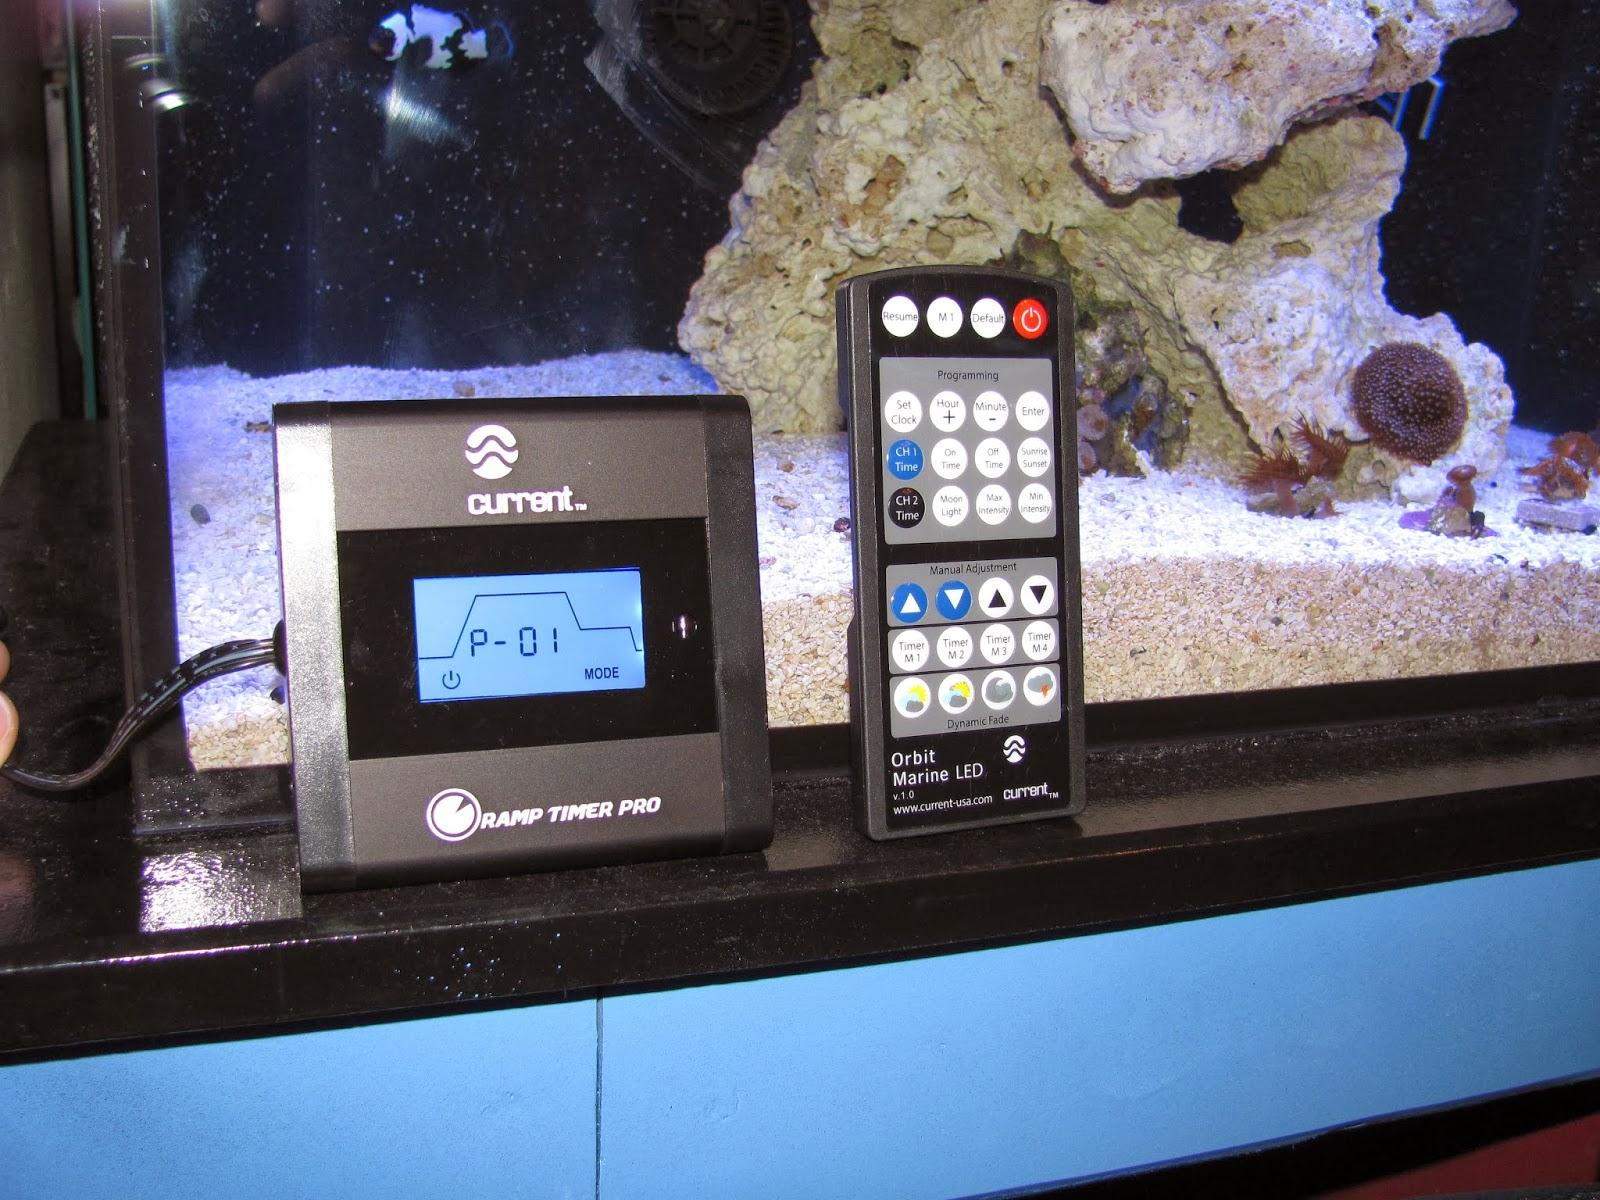 First Impressions Current Usa Orbit Marine Led Aquarium Light